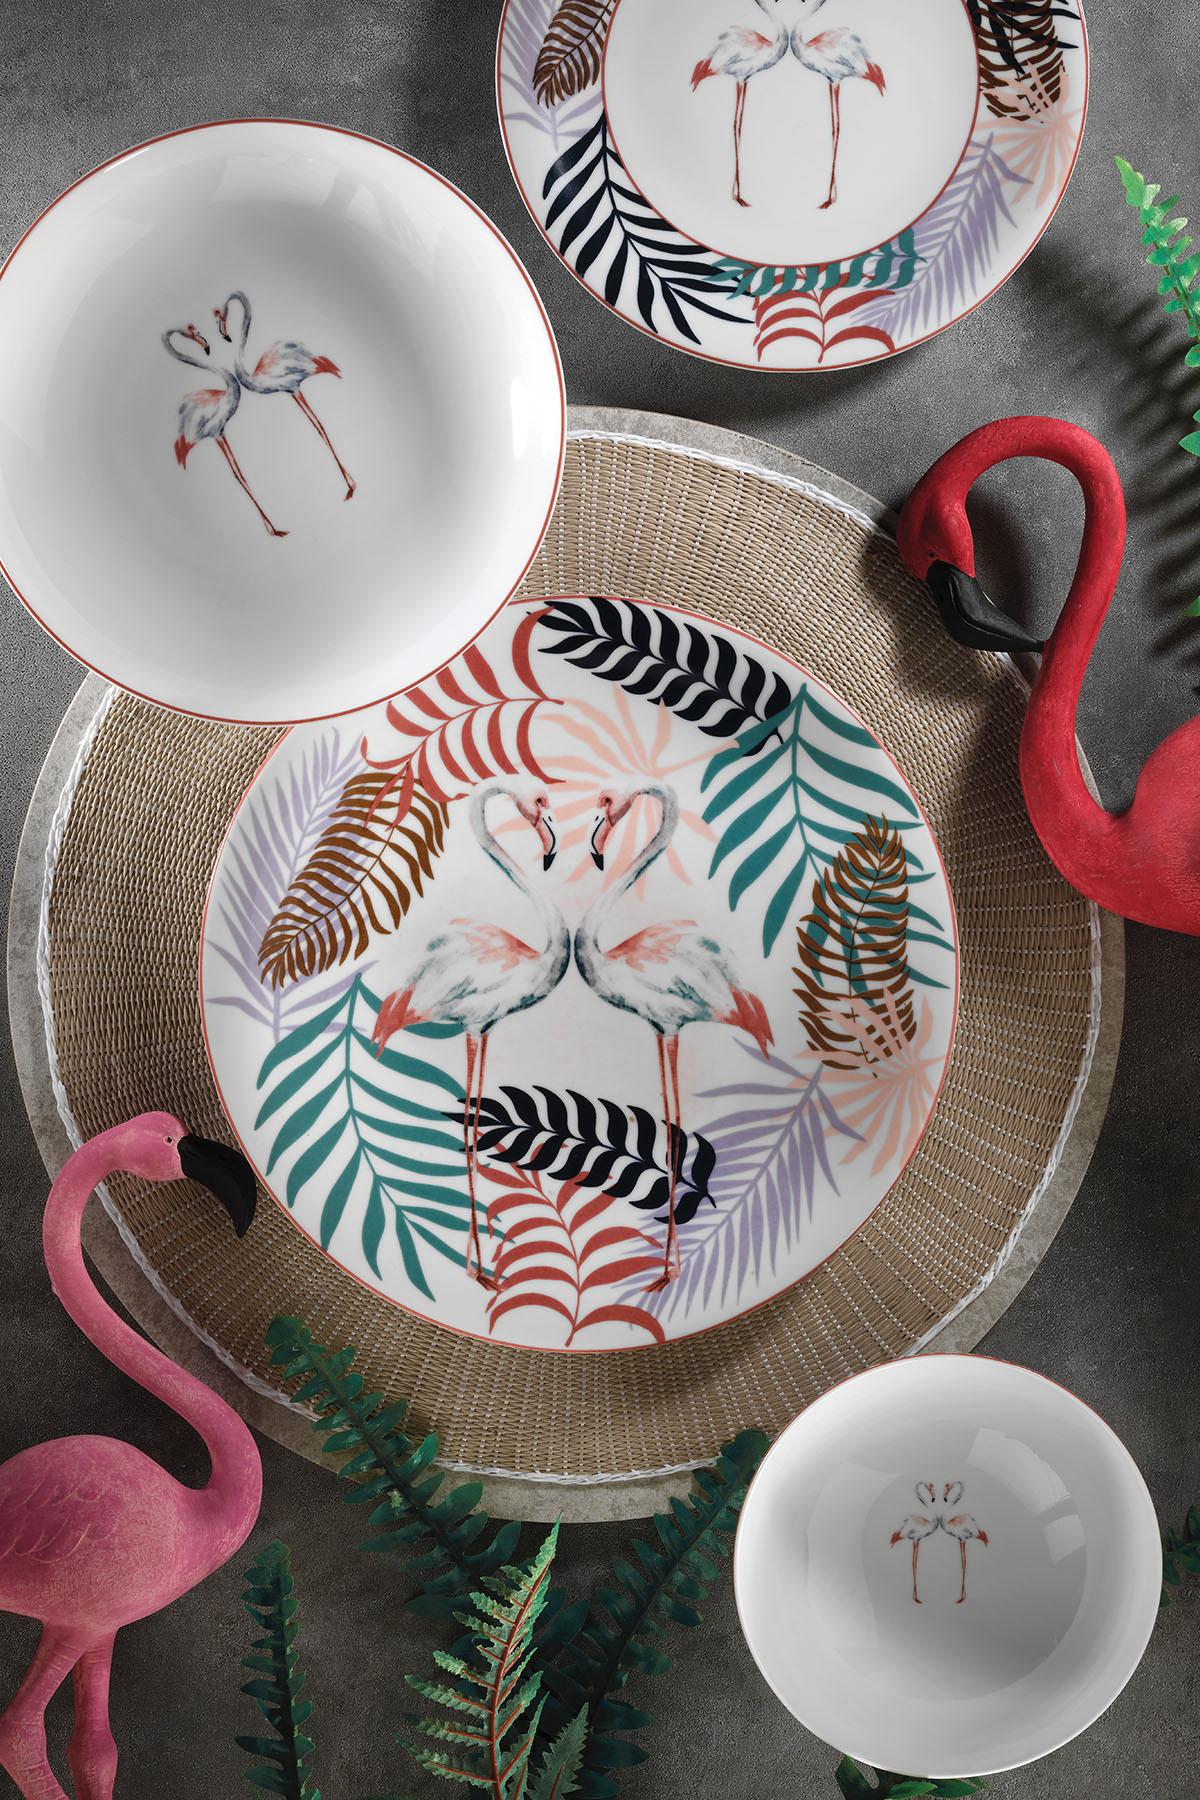 KÜTAHYA PORSELEN - Kütahya Porselen Flamingo 24 Parça Yemek Seti